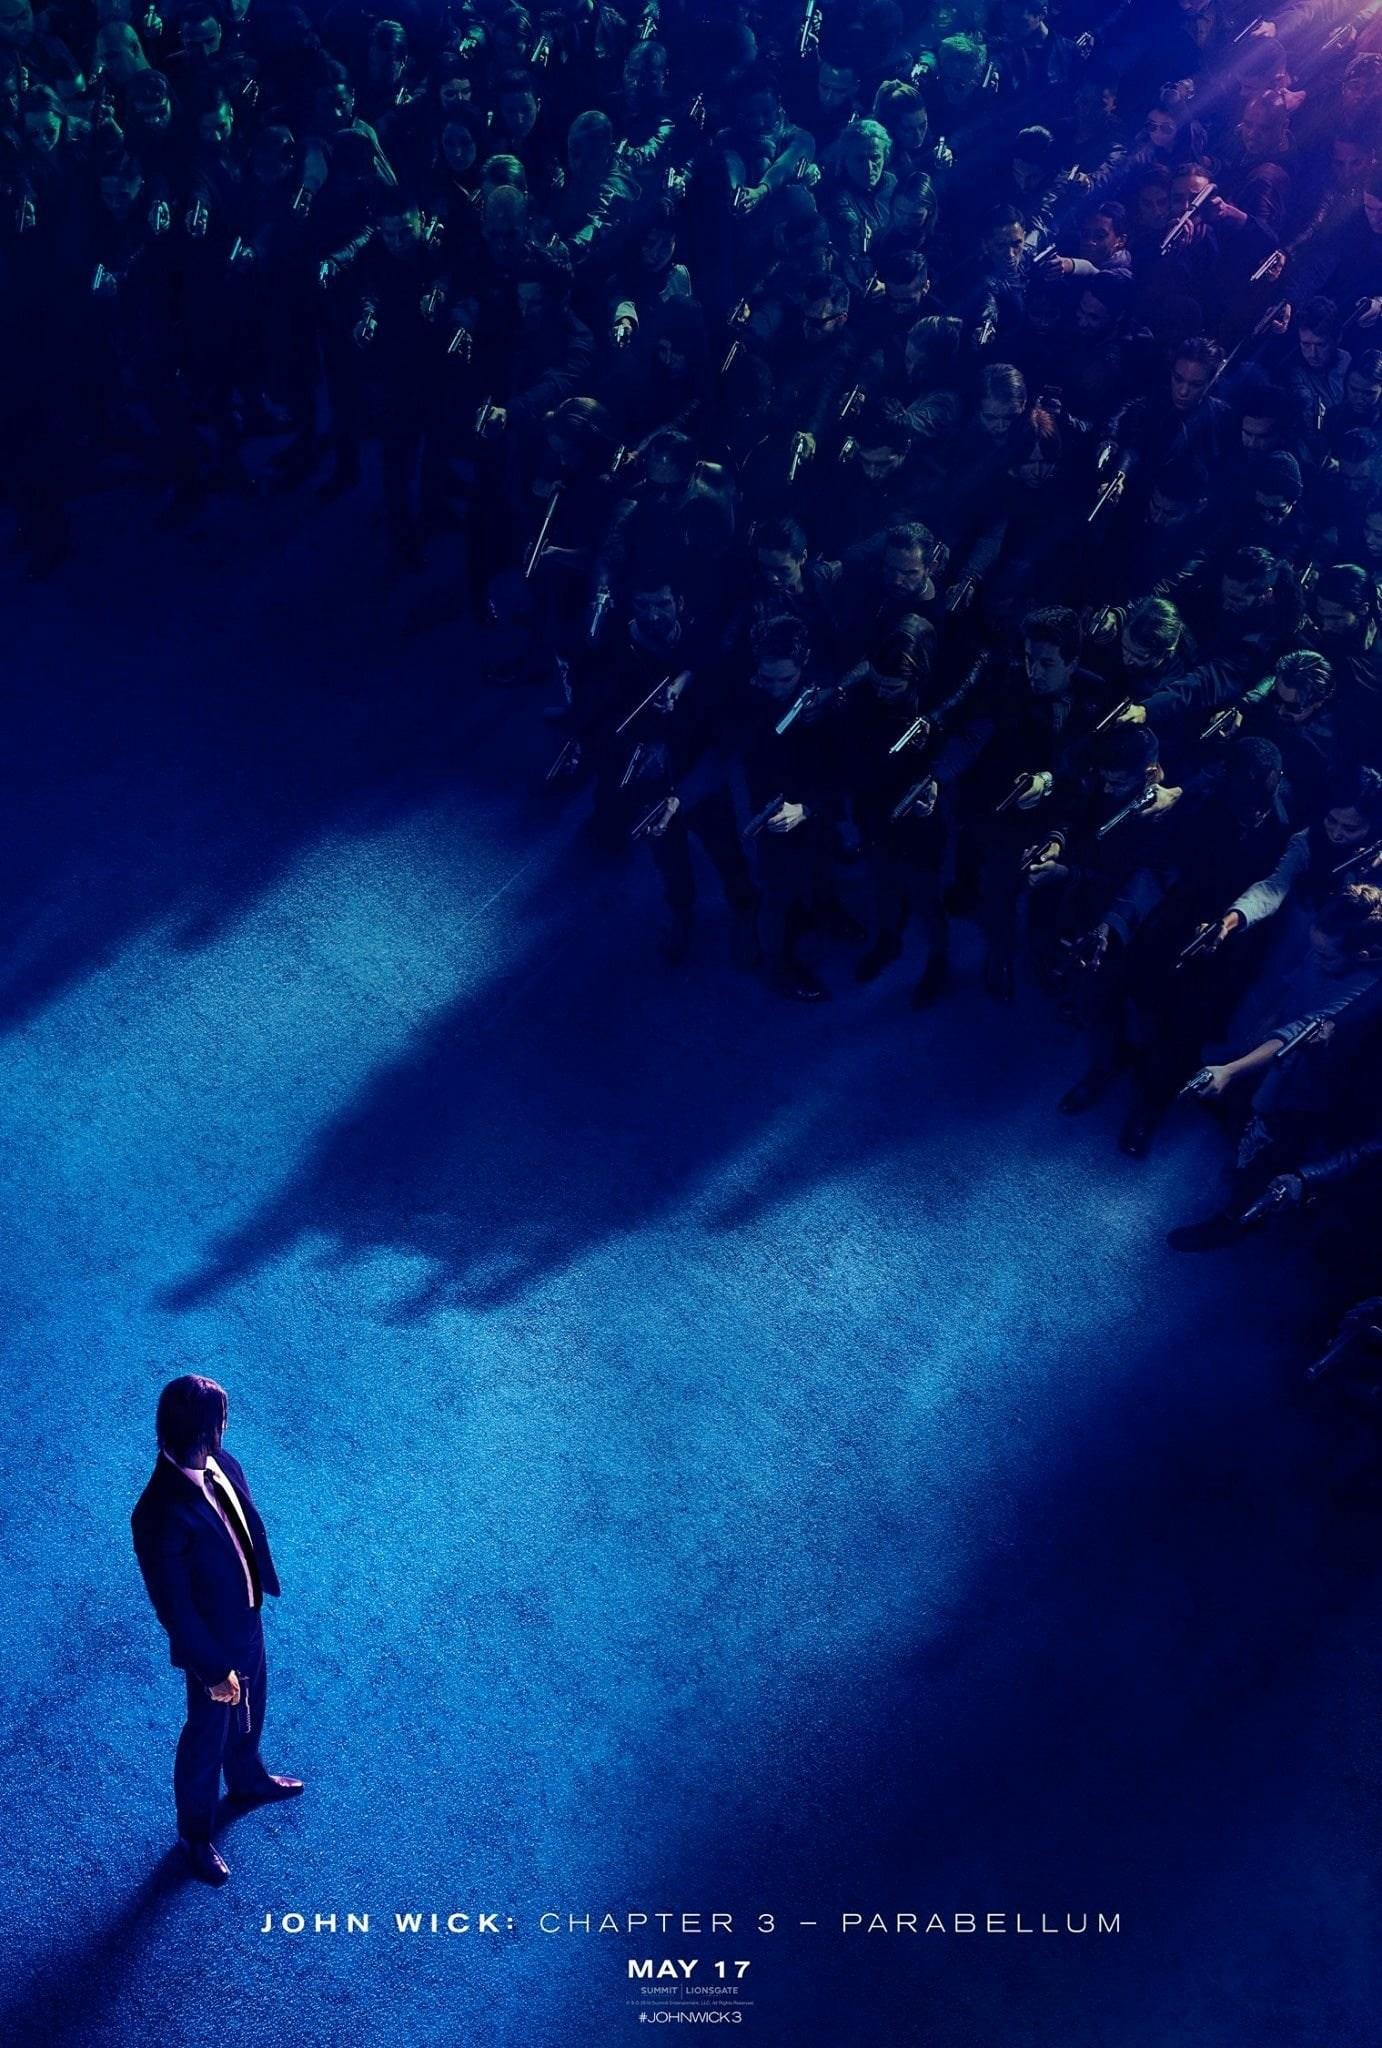 watch john wick 2 full movie with english subtitles